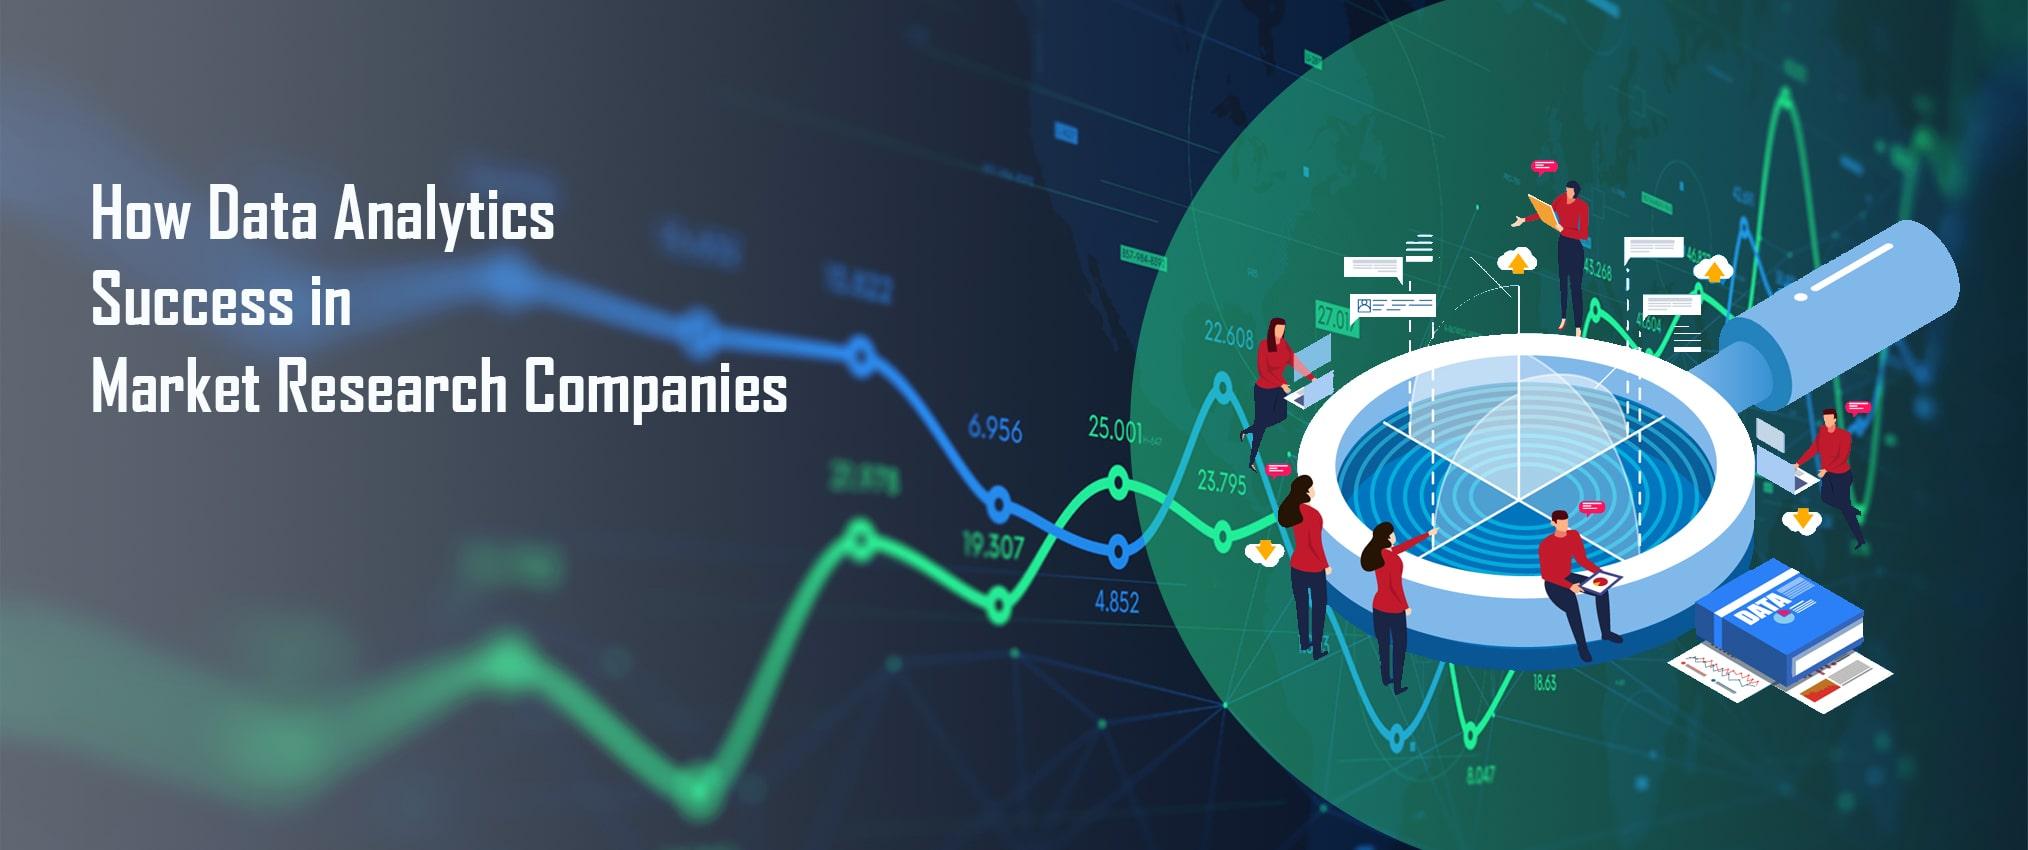 data analytics market research companies